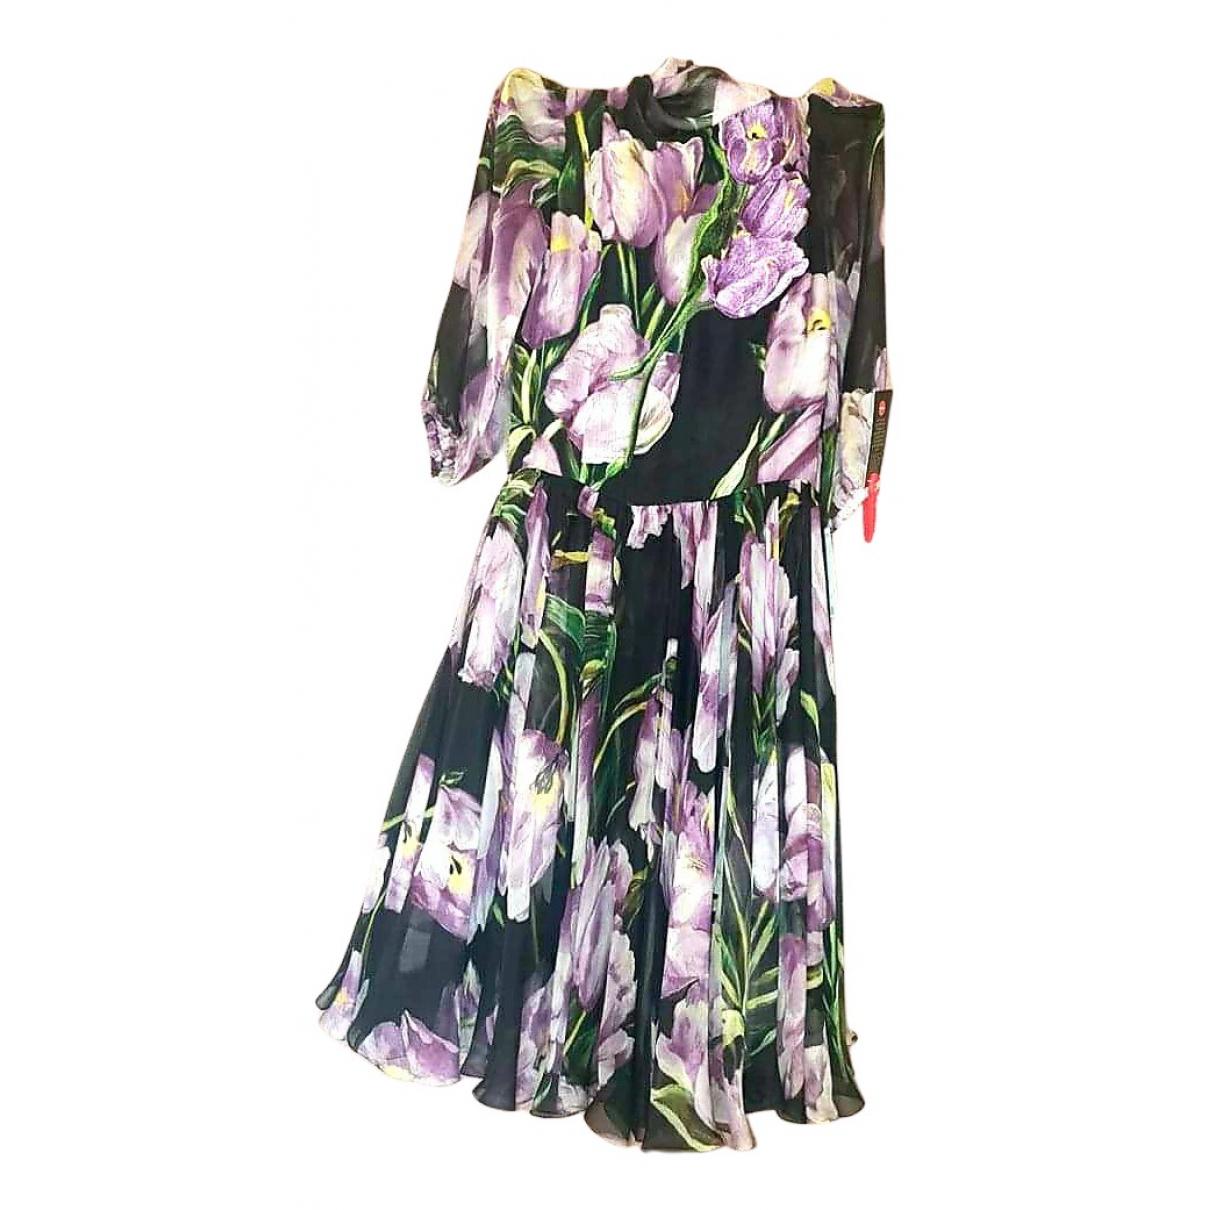 Dolce & Gabbana \N Black Silk dress for Women 38 IT